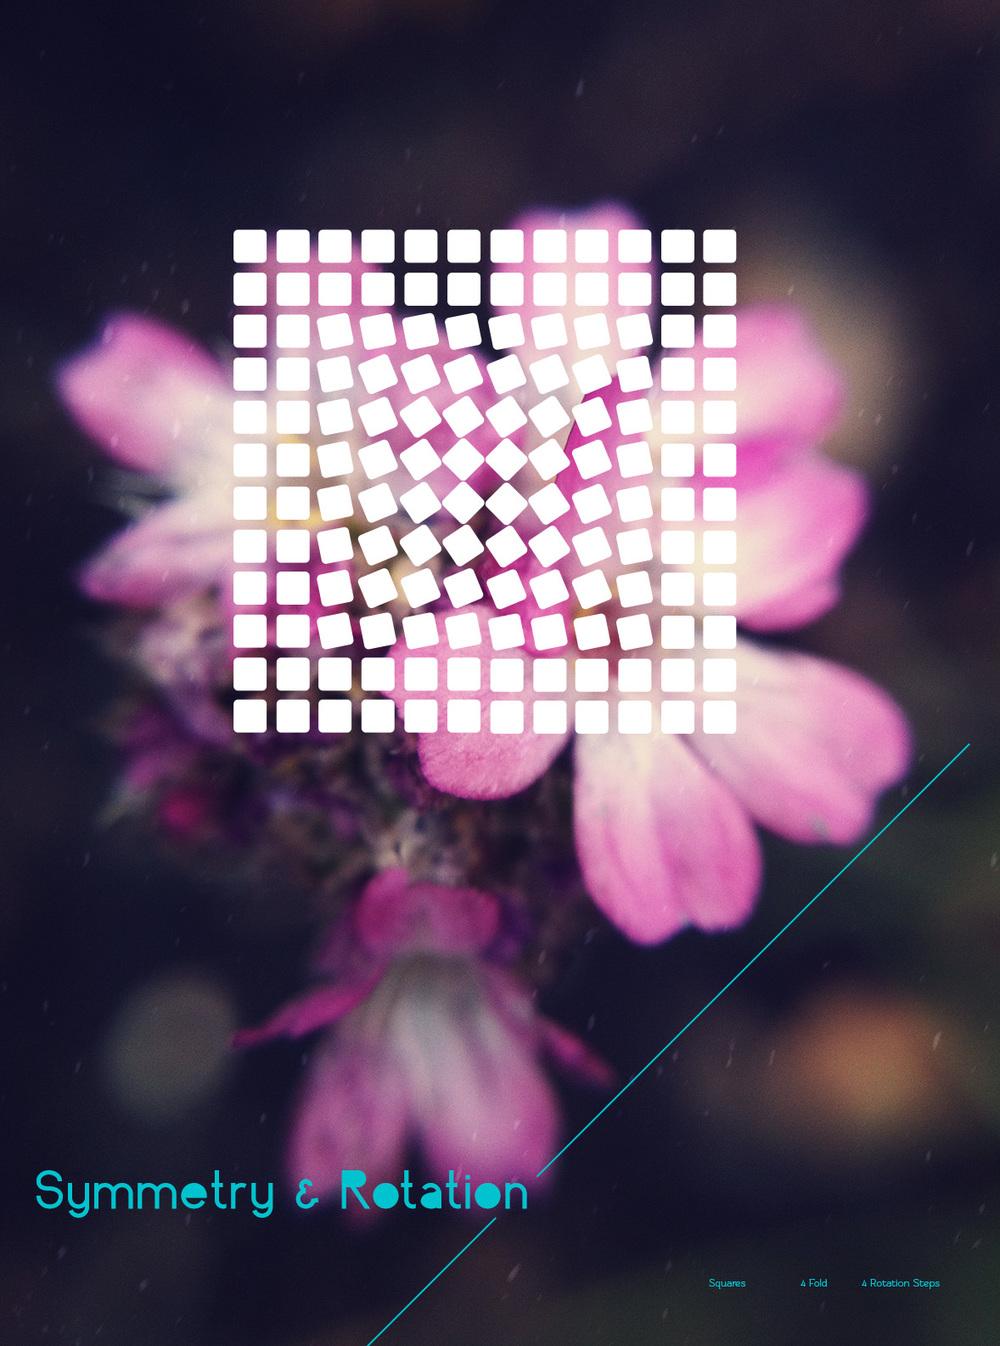 vintagephoto_02_square.jpg